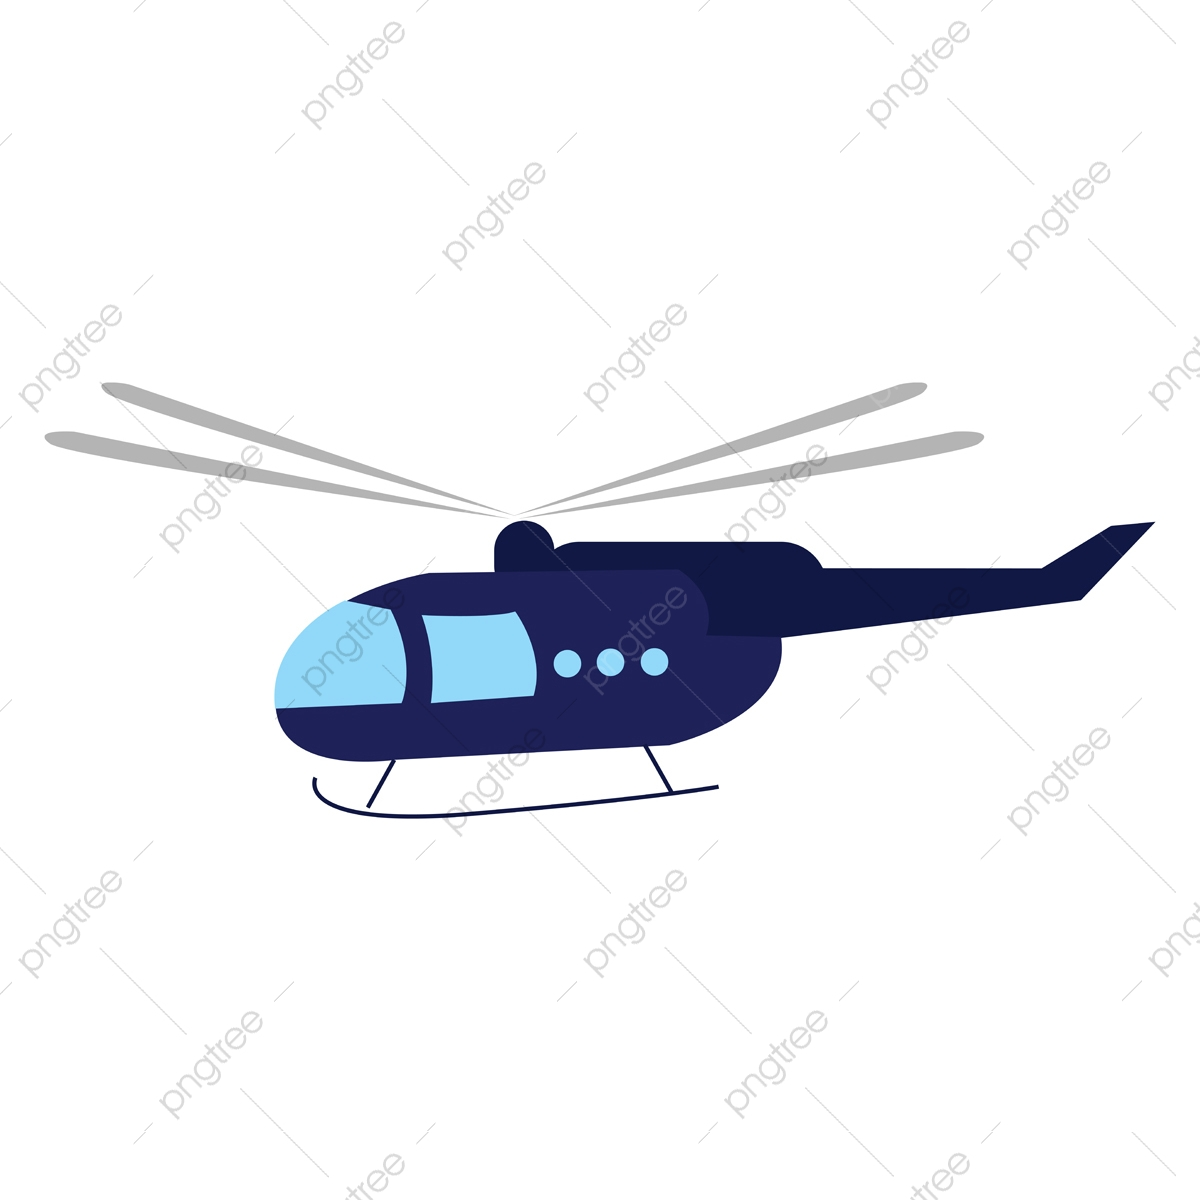 a blue helicopter vector or color illustration blue helicopter helipad png and vector with transparent background for free download https pngtree com freepng a blue helicopter vector or color illustration 5266993 html